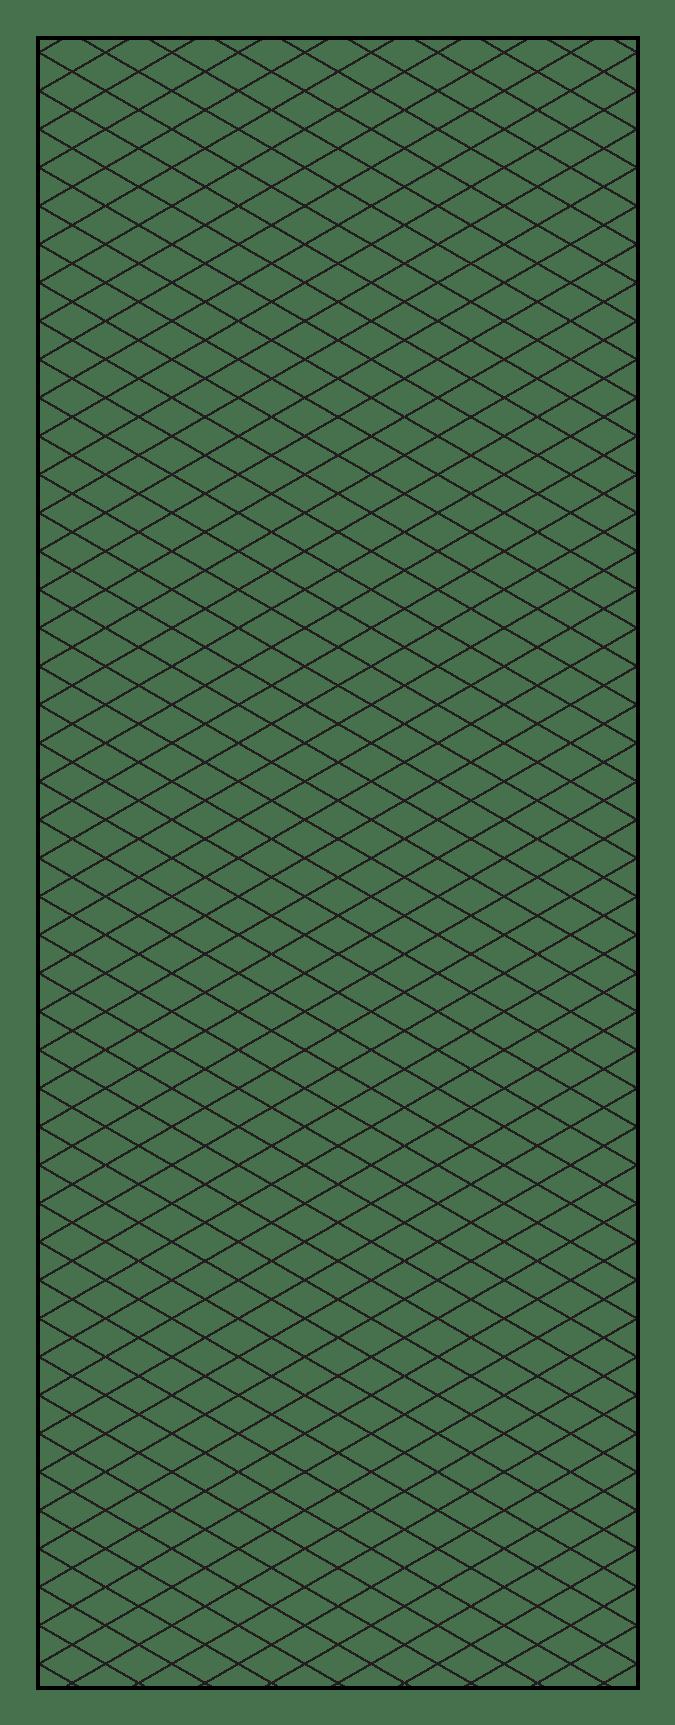 3 8 graph paper